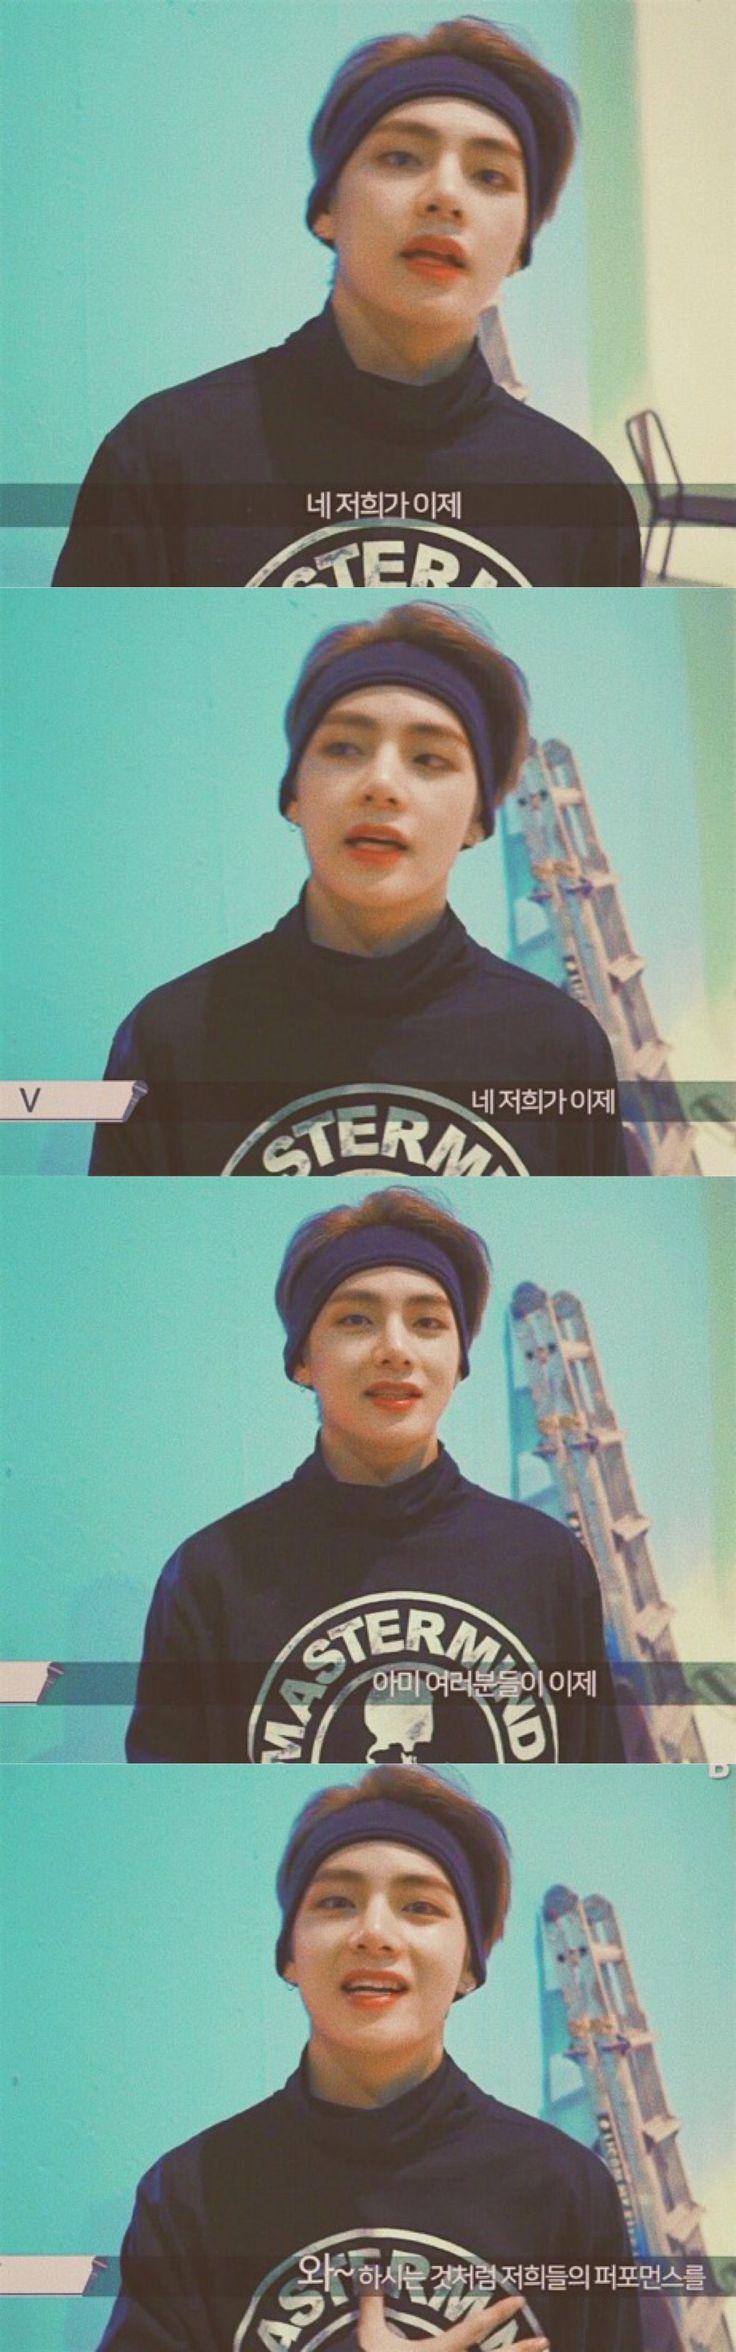 Tae   『˗ˏˋPinterest - @strawberrymurlk ˎˊ˗』